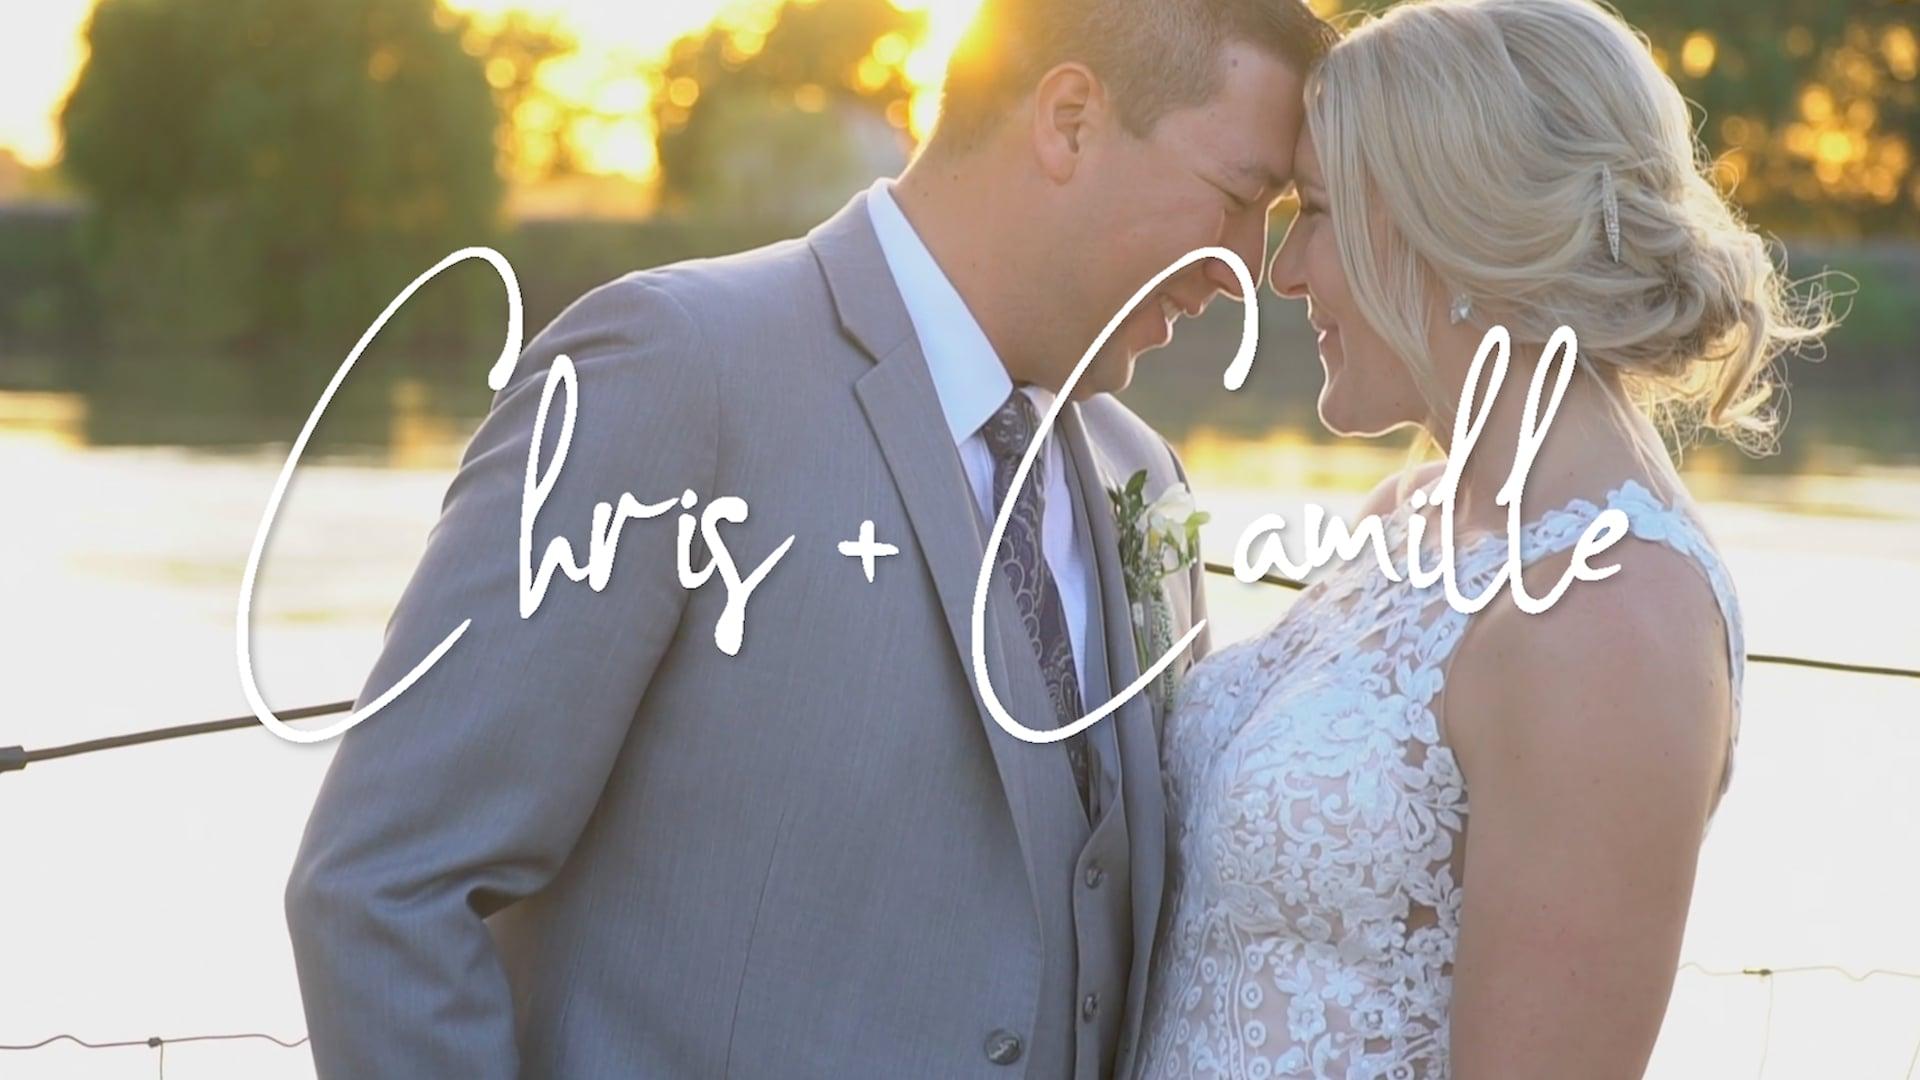 Chris + Camille | Wedding Highlight